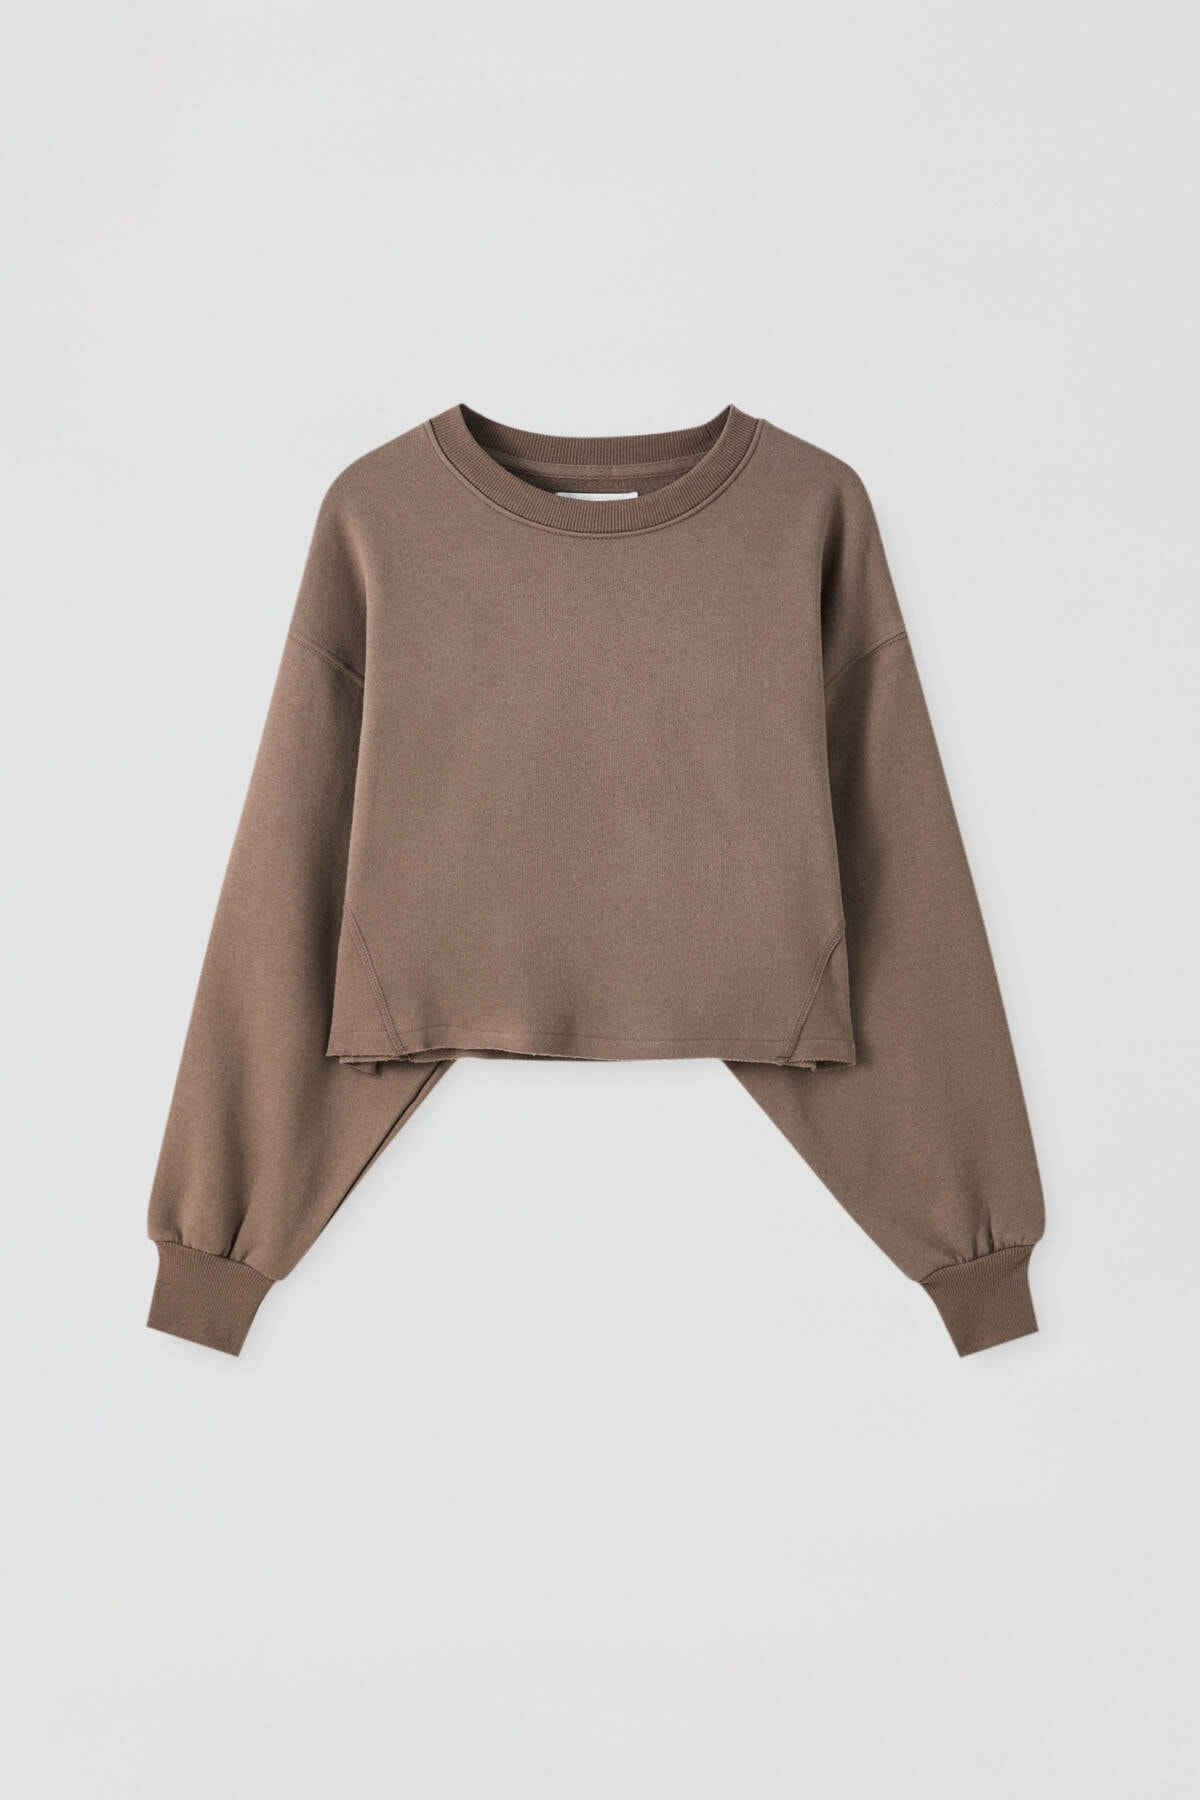 Pull & Bear Kadın Boz Gri Rahat Crop Fit Sweatshirt 09594315 4